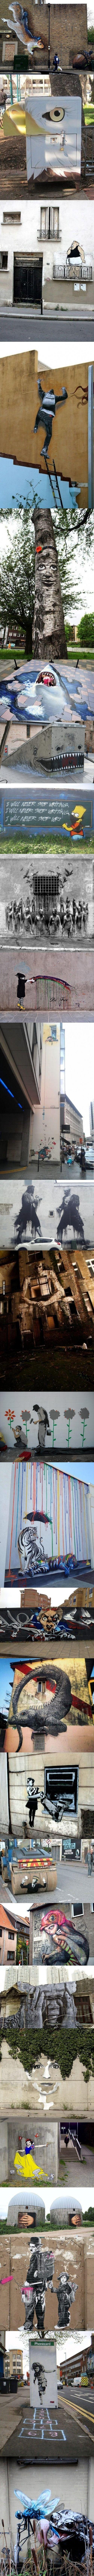 Streets Around The World...